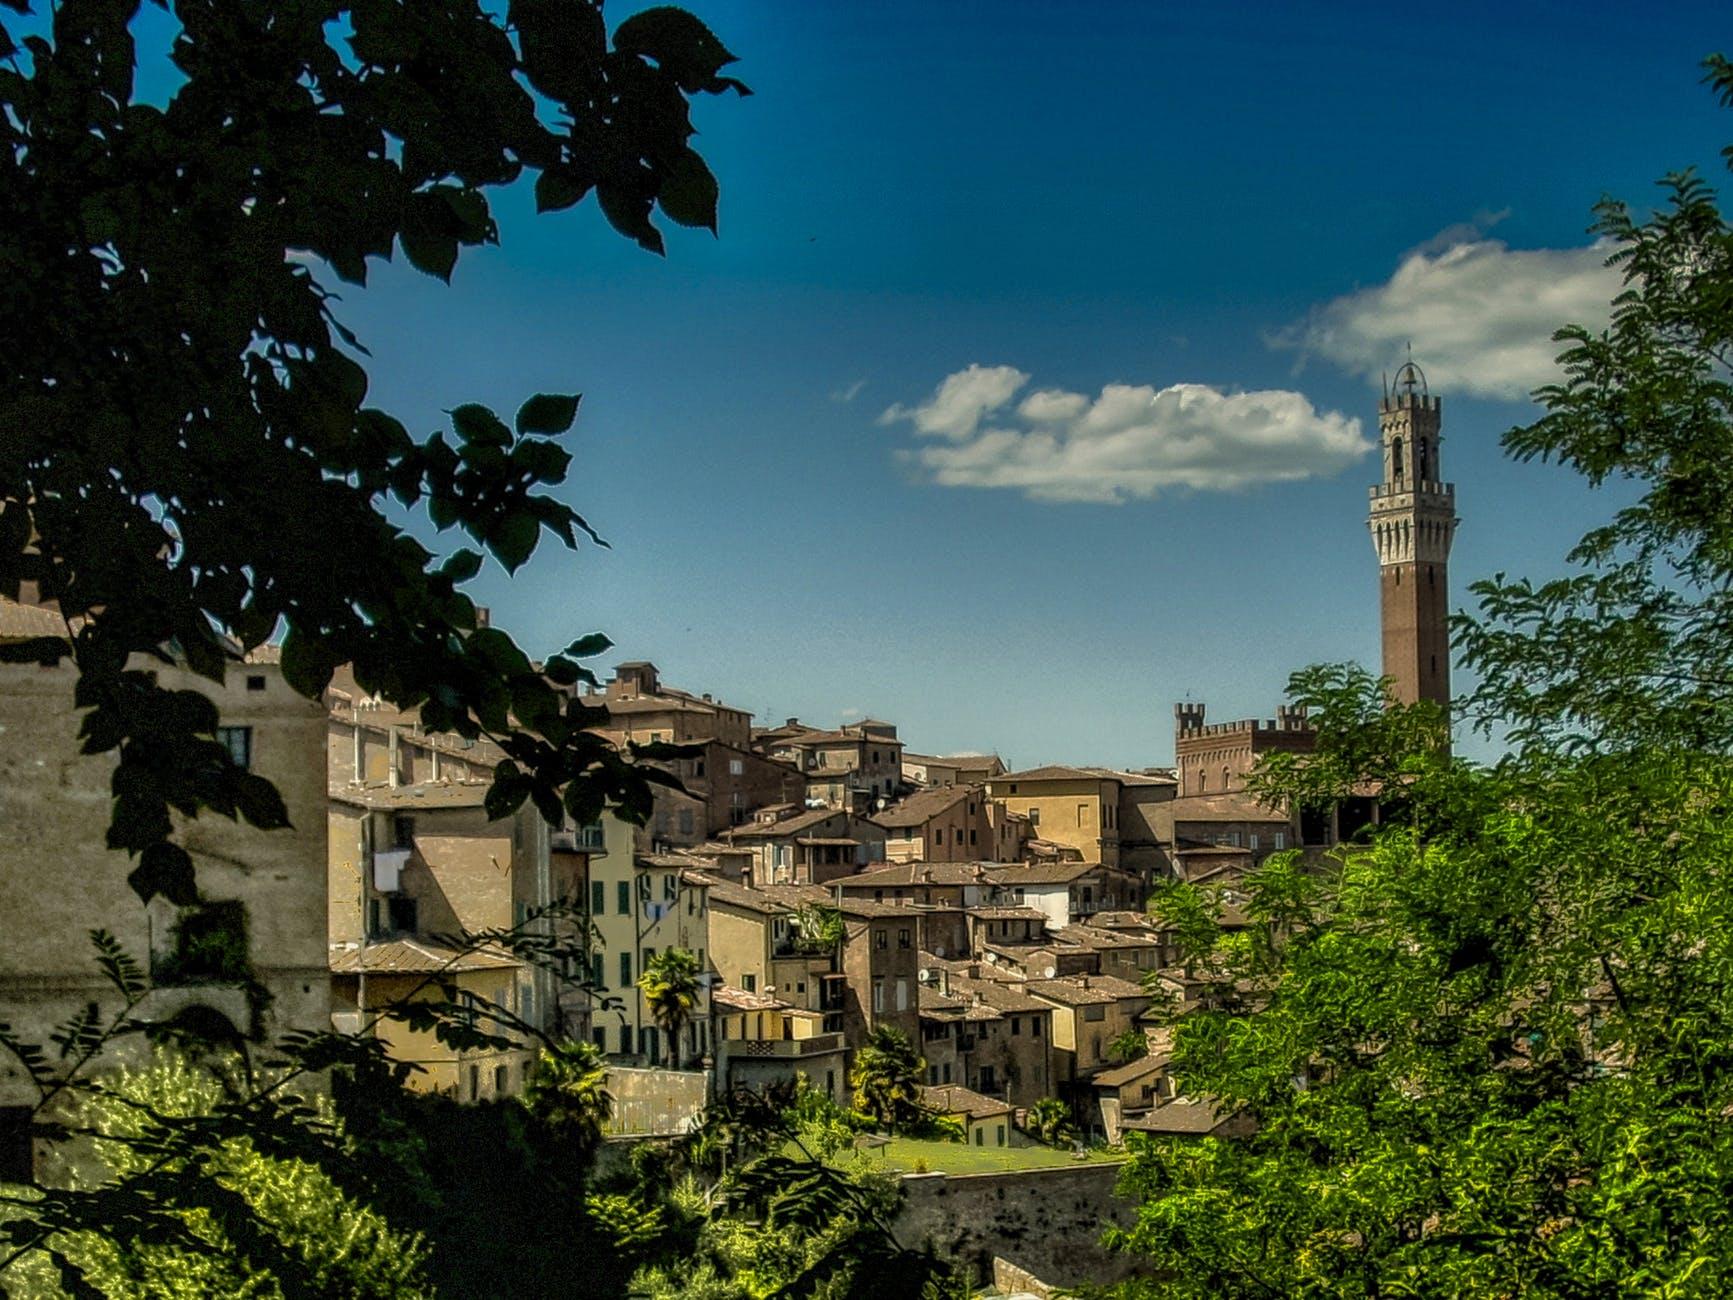 The Best Amenities for Upscale Italian Villas